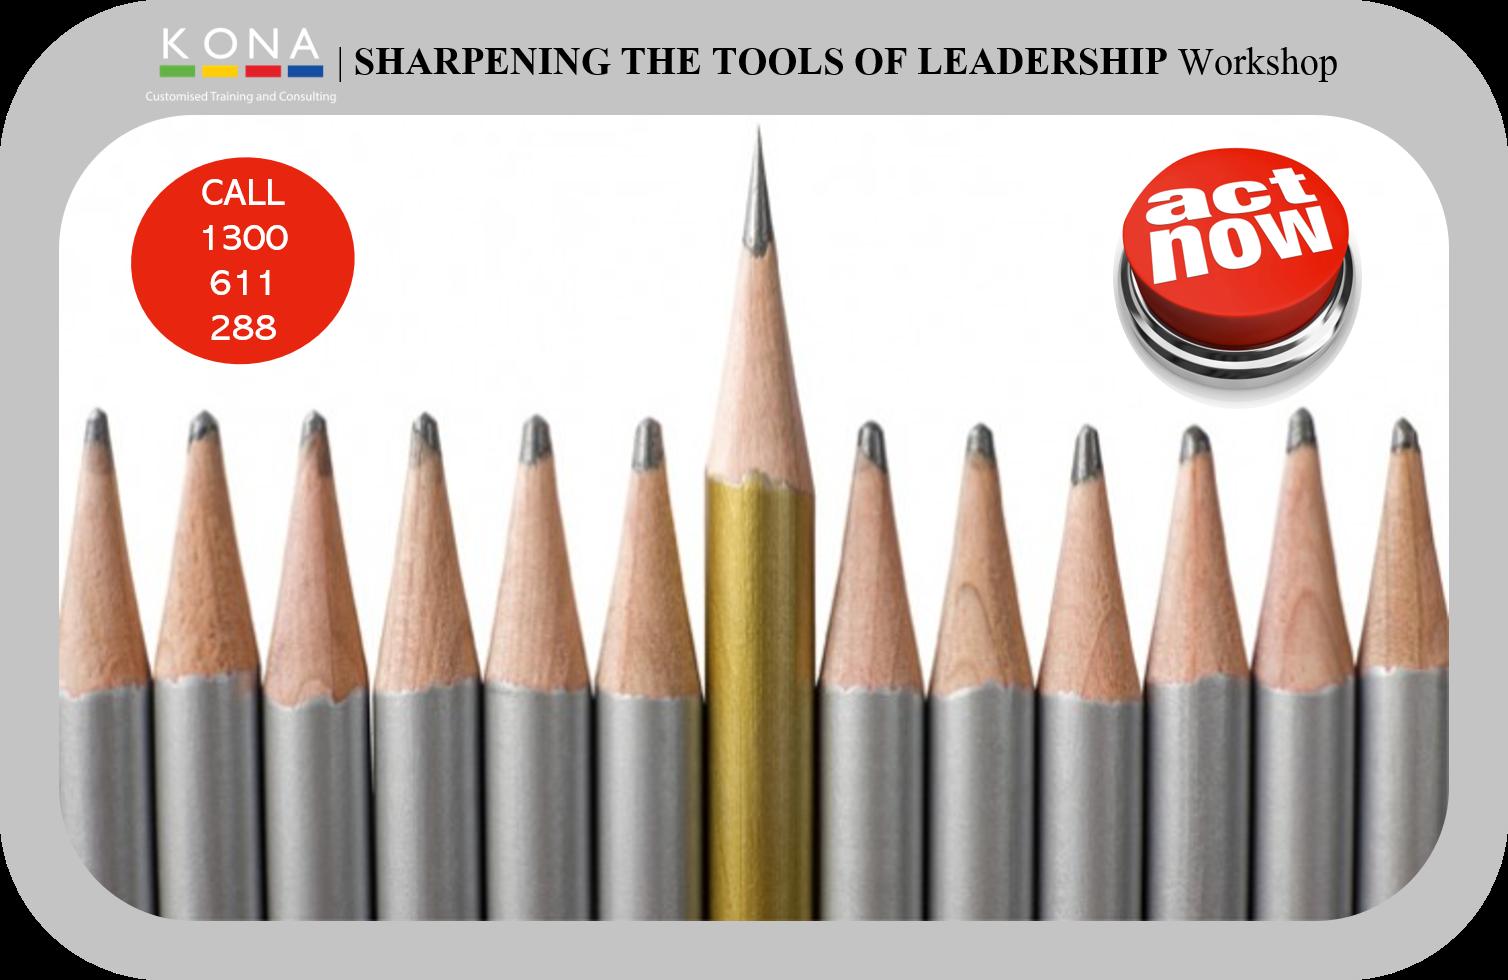 KONA Group | SHARPENING THE TOOLS OF LEADERSHIP Workshop